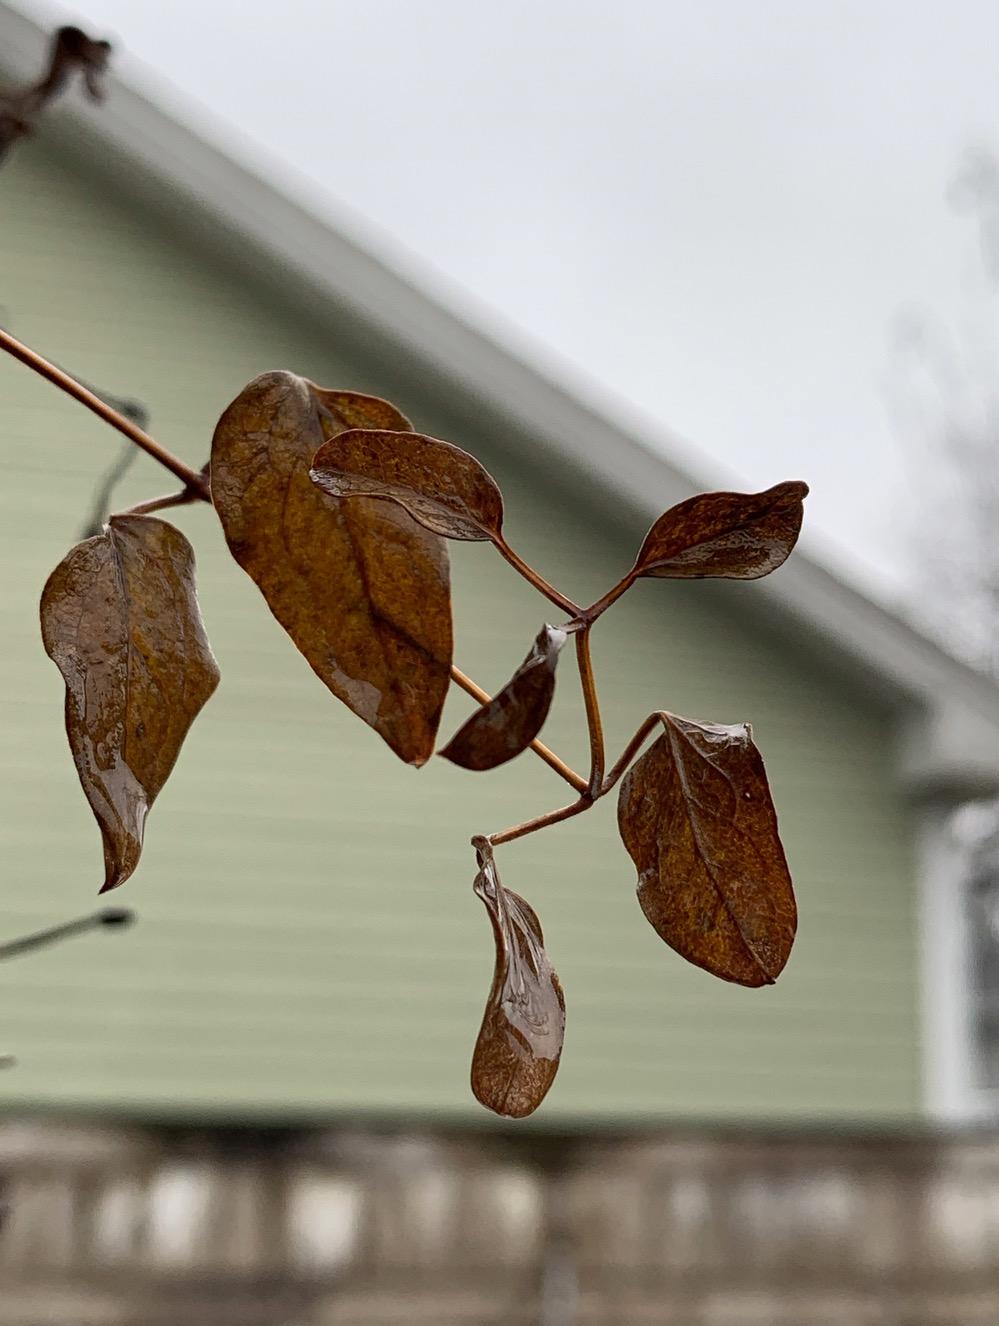 Clematis leaves in December ( iPhone XS). ©2018 Sean Walmsley